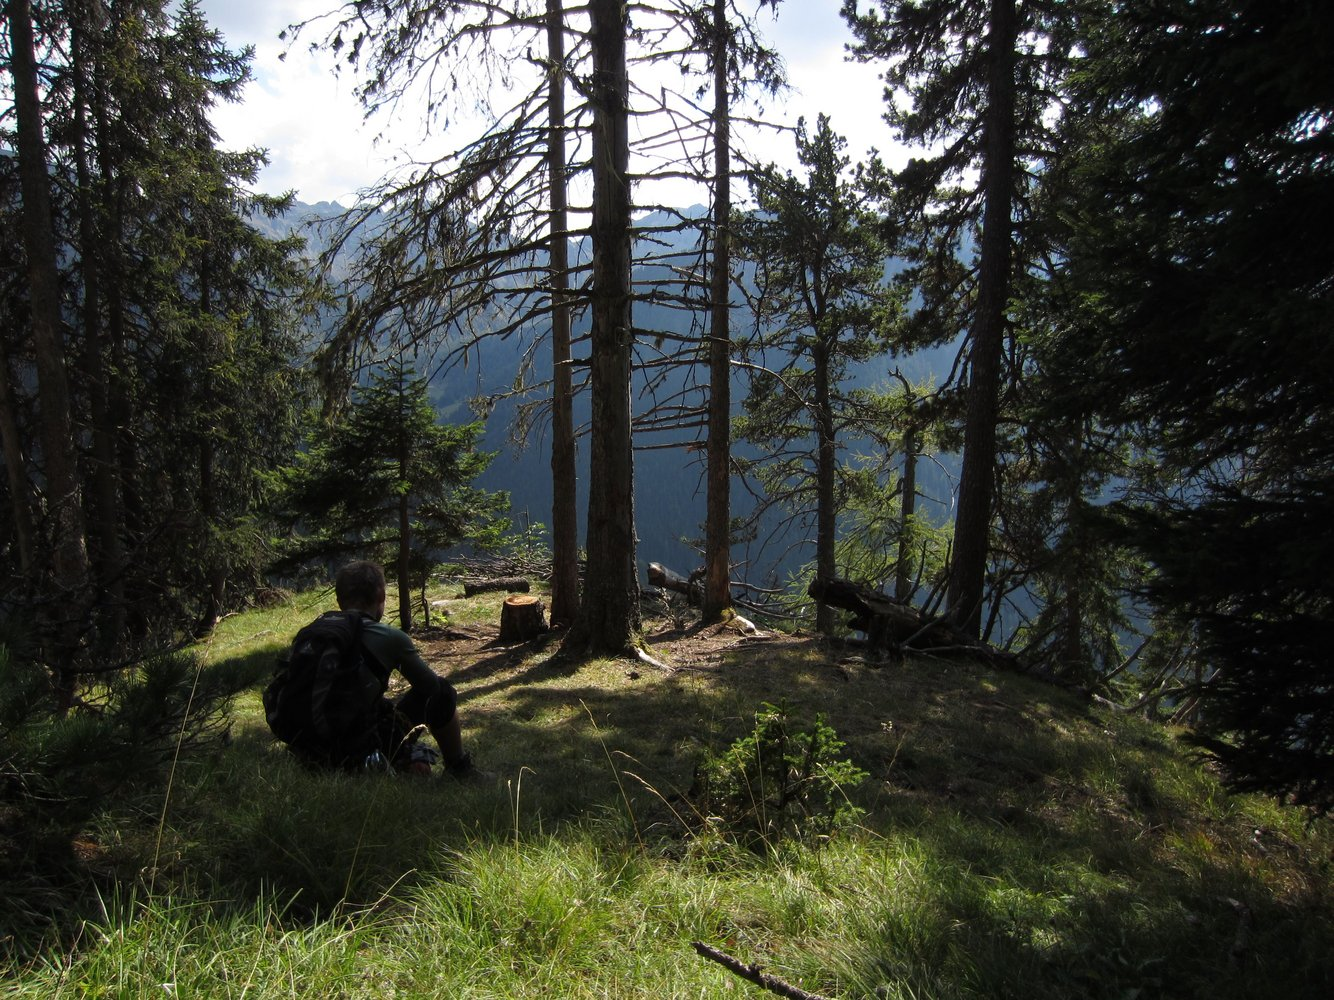 Klettersteig Magnifici Quattro : Via ferrata i magnifici 4 klettersteig bergsteigen.com